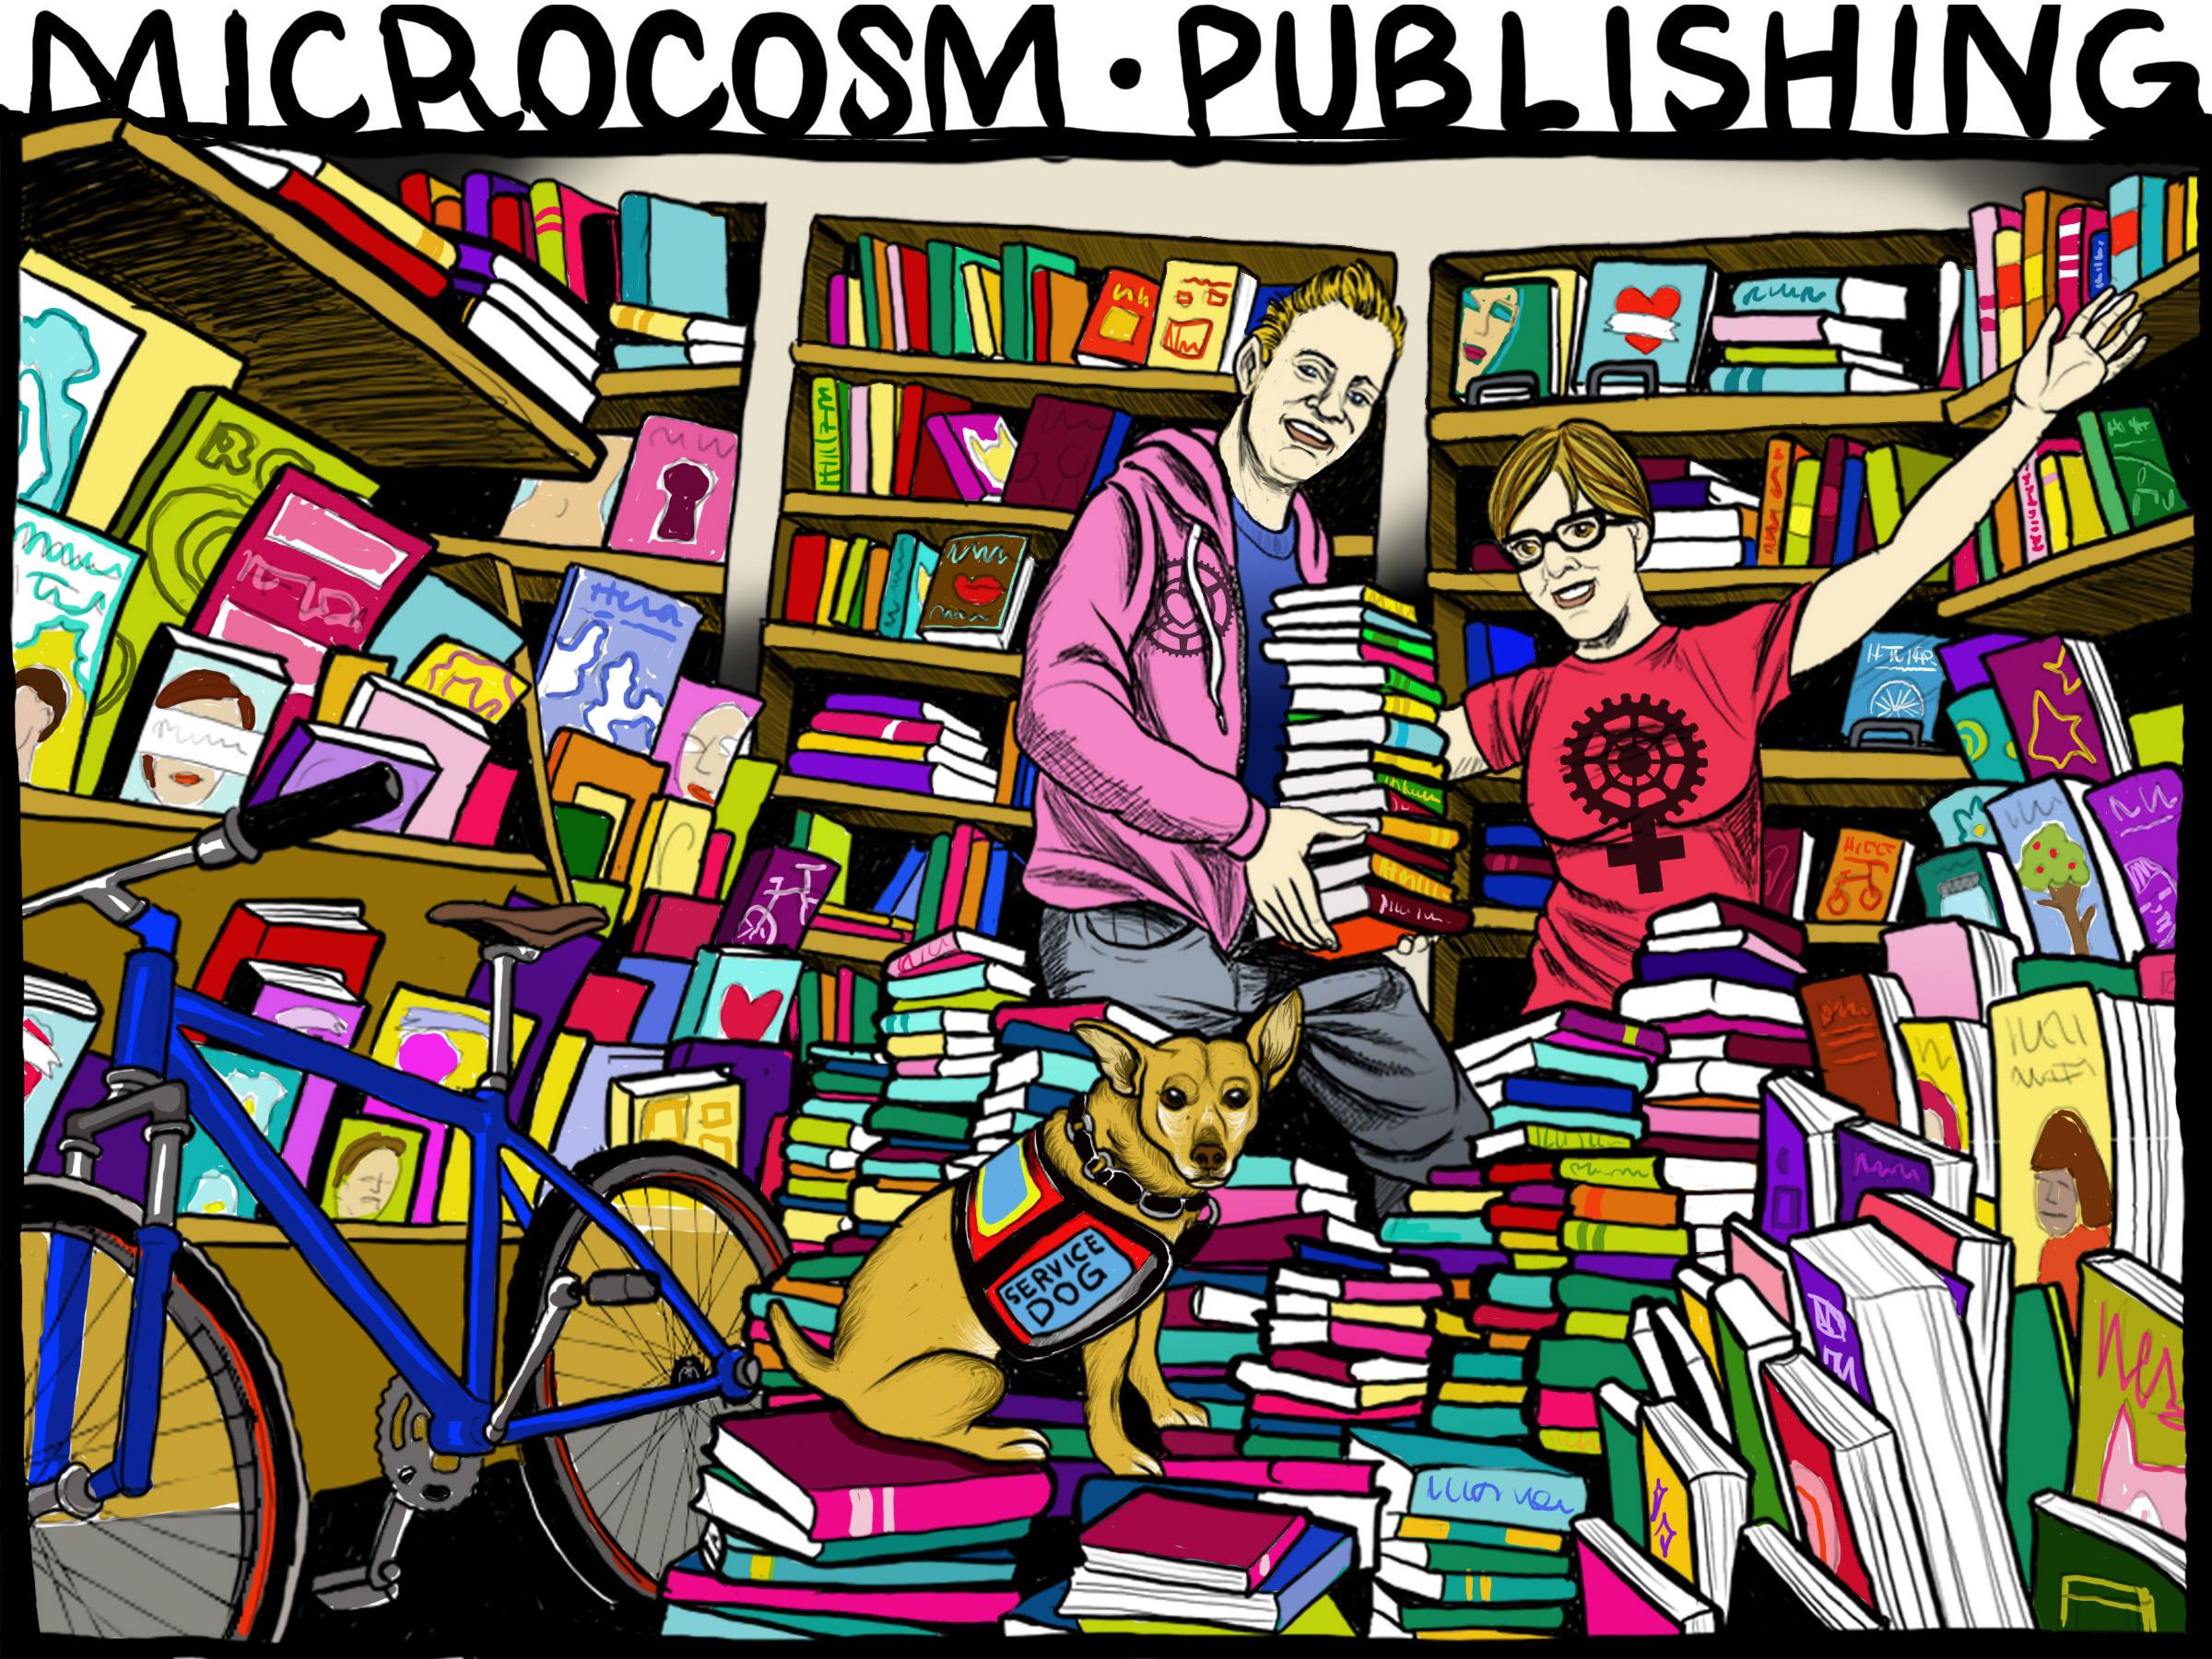 Microcosm Publishing & Distribution